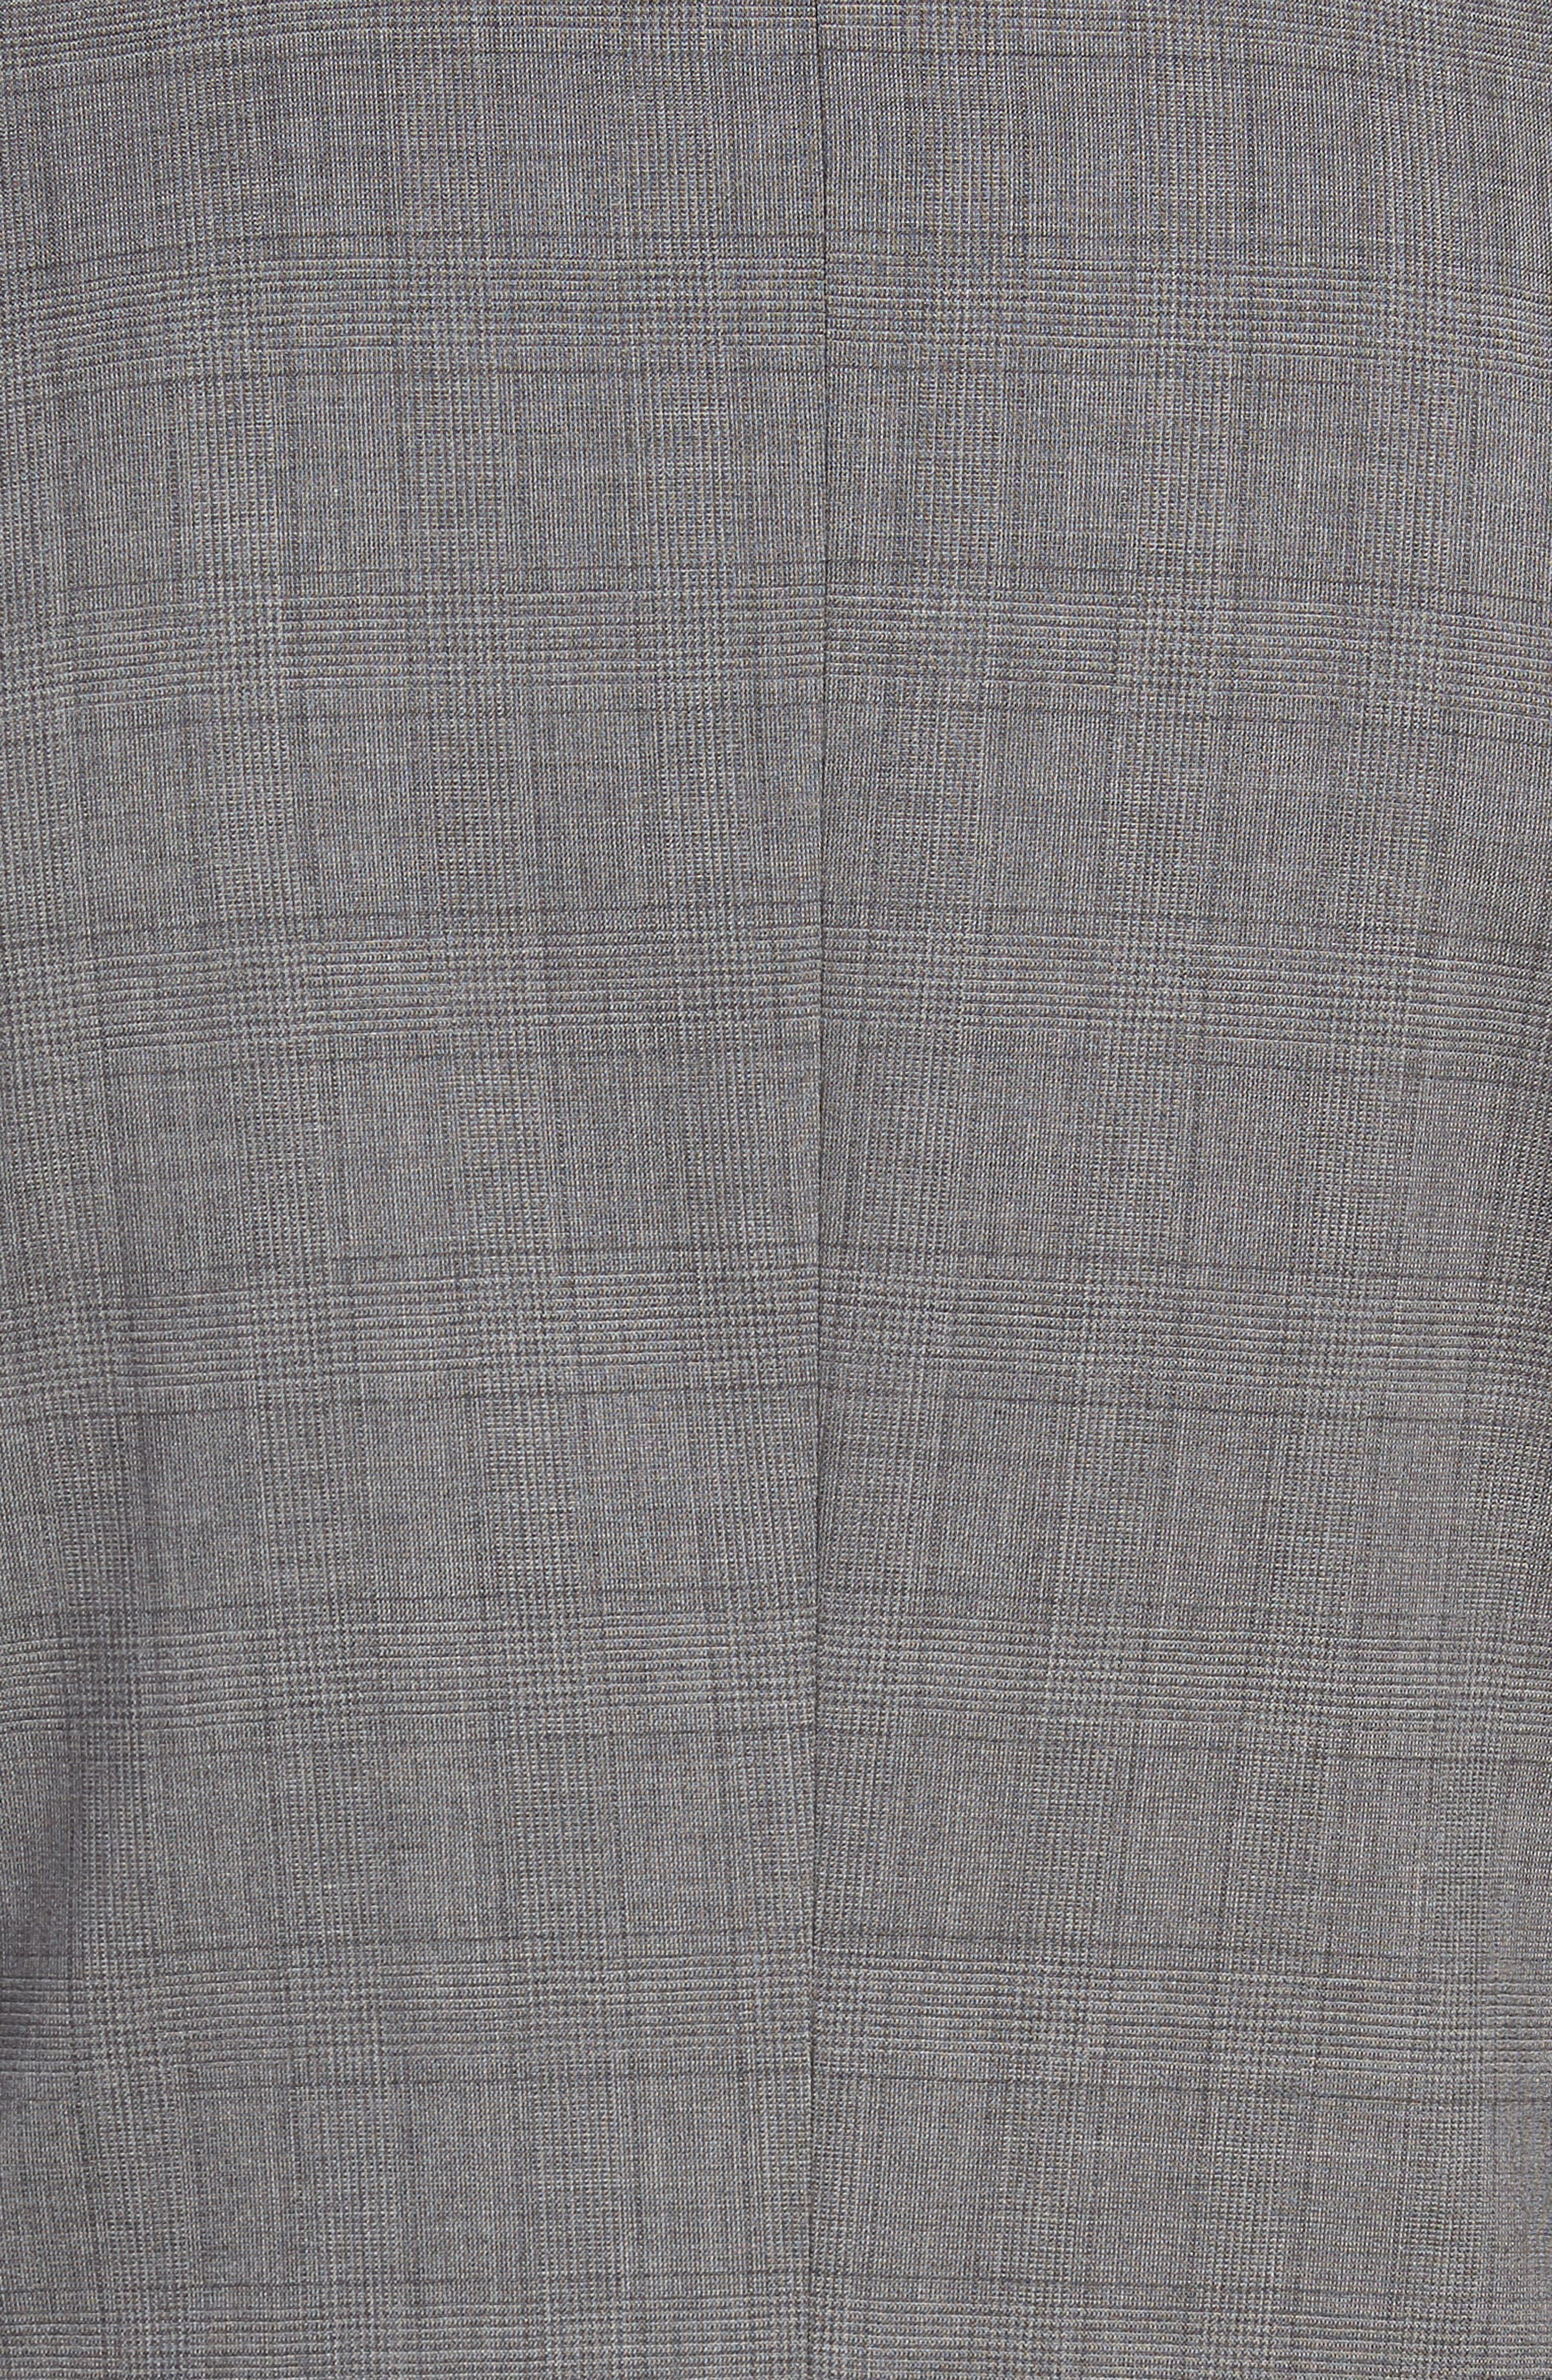 BOSS, Huge/Genius Trim Fit Plaid Wool Suit, Alternate thumbnail 7, color, 069